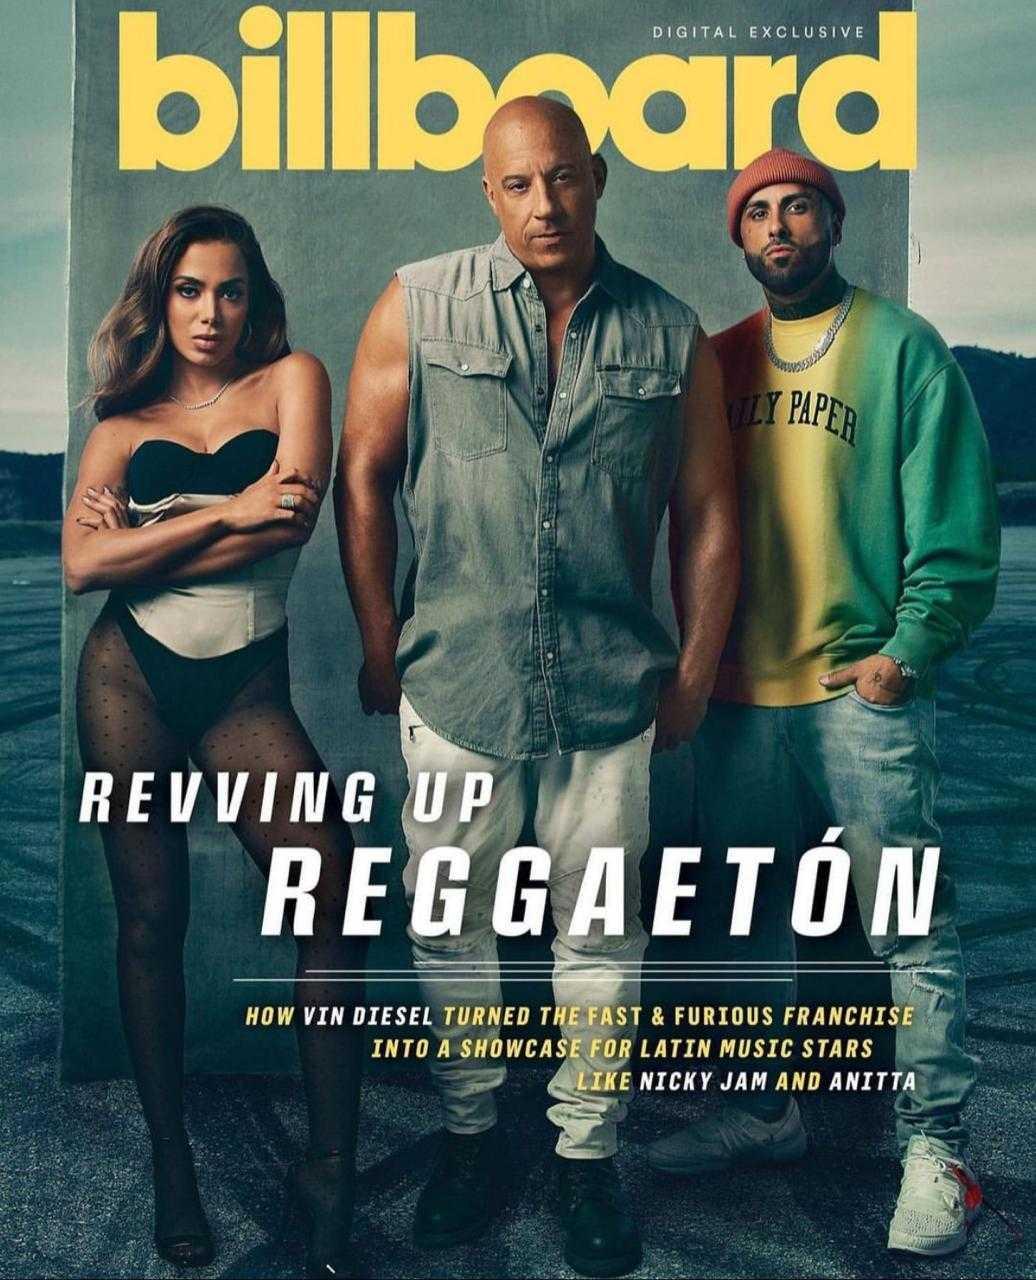 Anitta estampa capa digital da 'Billboard' ao lado de Vin Diesel e Nicky Jam (Foto: Reprodução/Instagram)